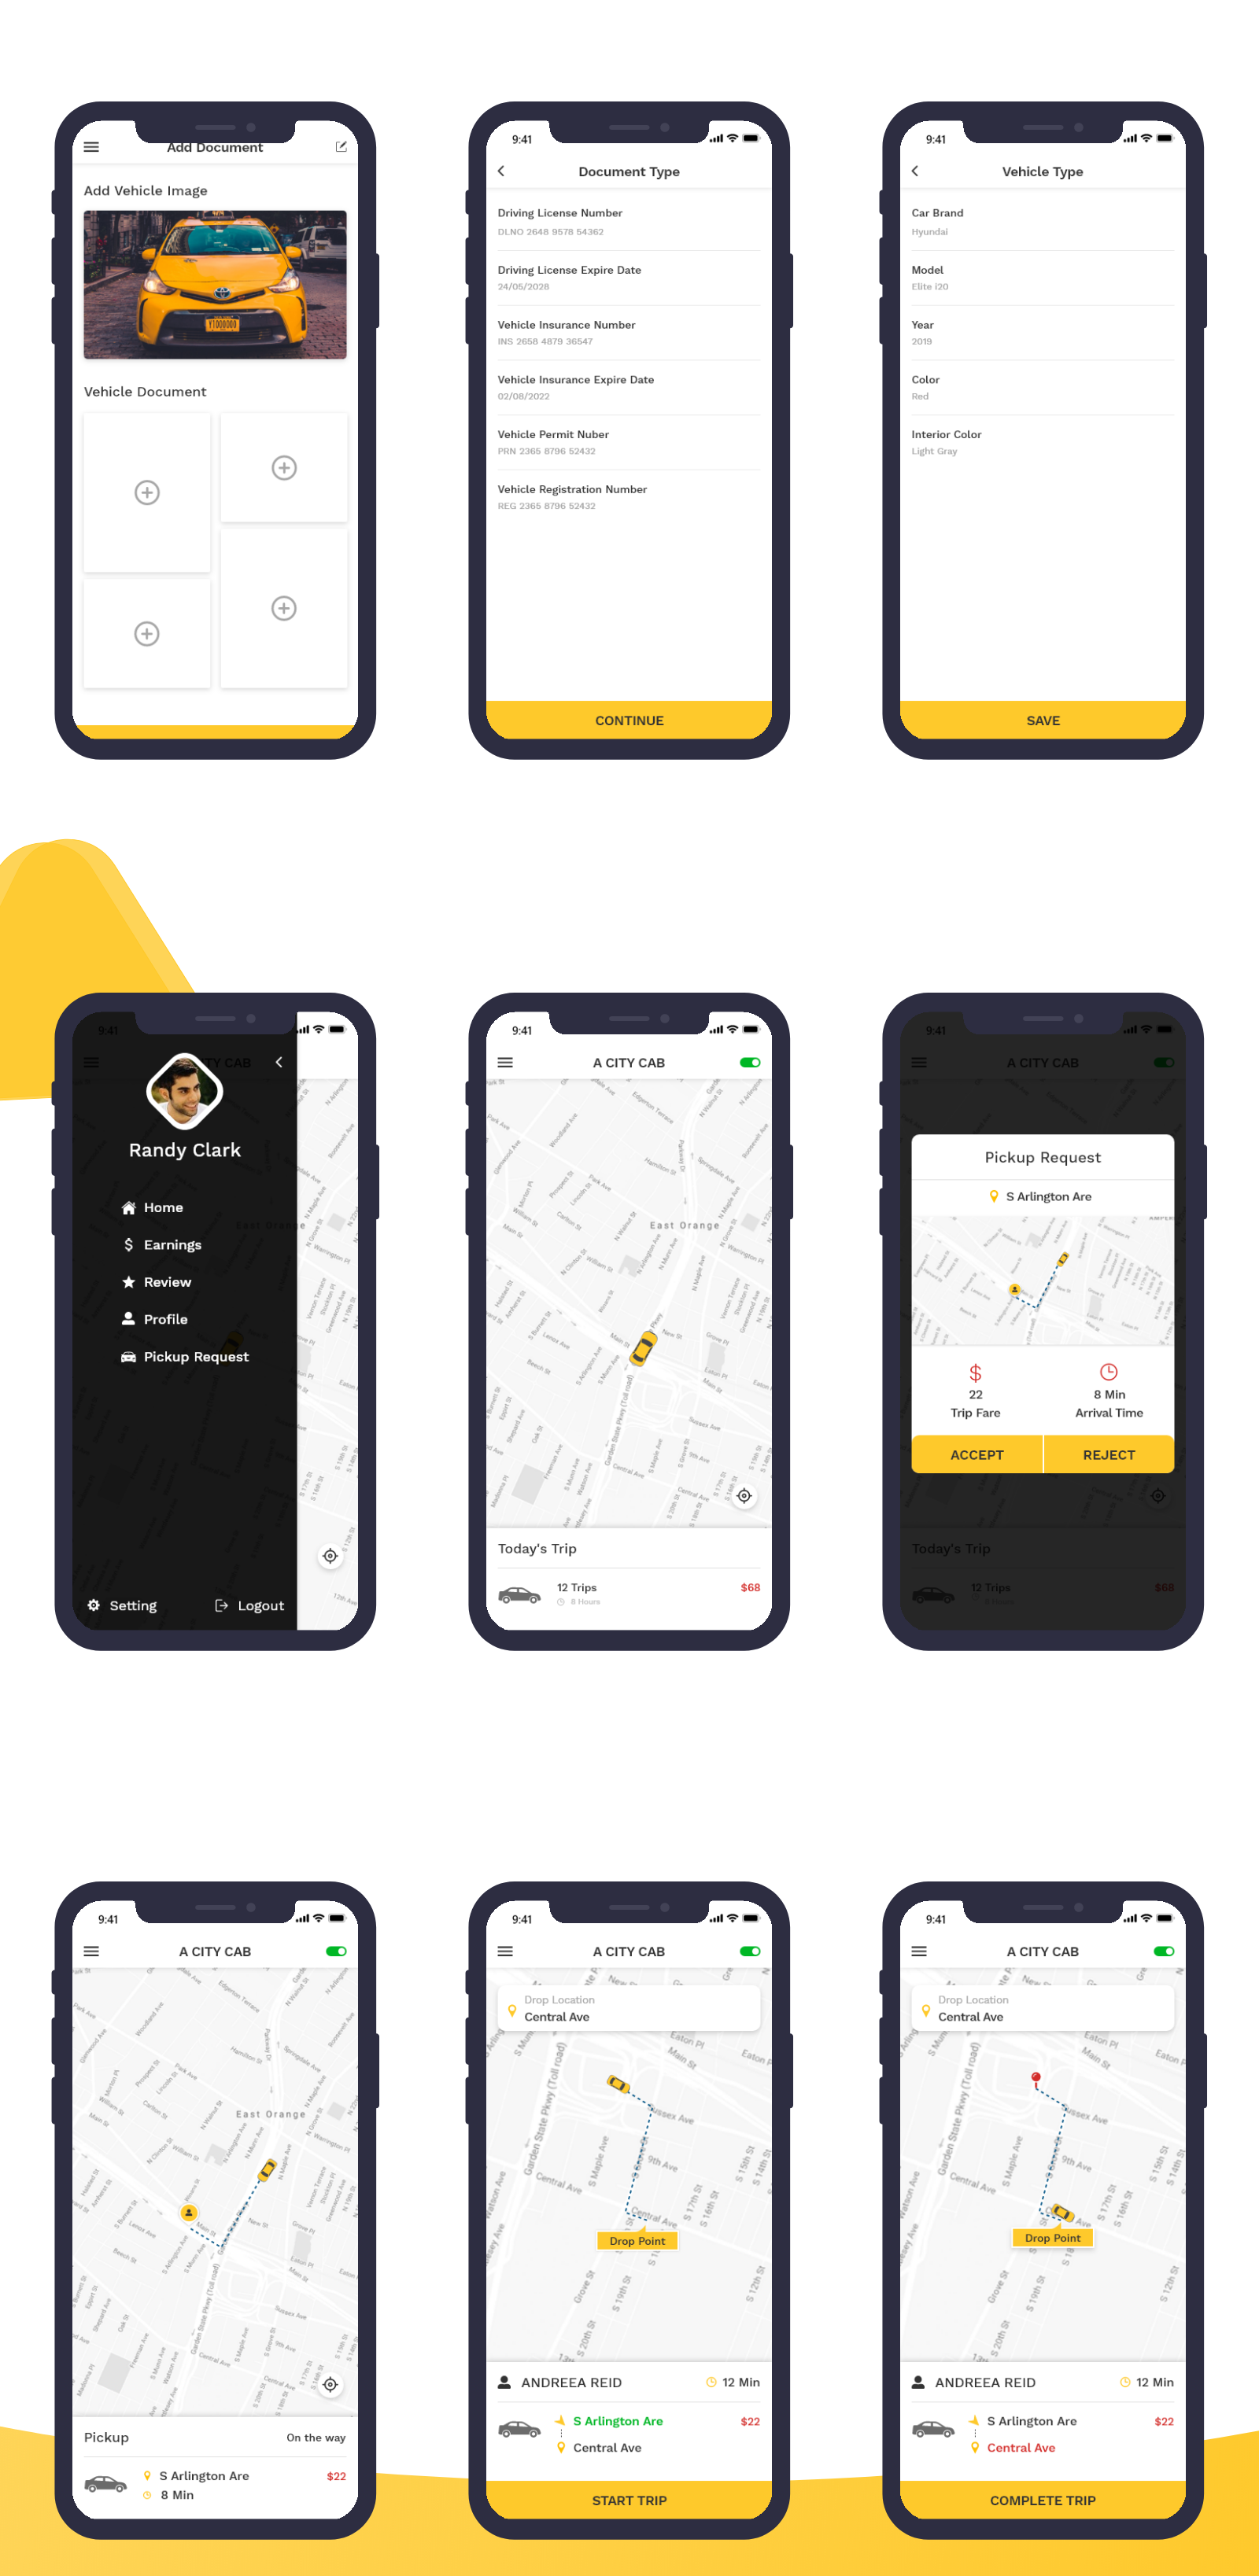 Citycab-ola-uber-taxi-booking-app-4